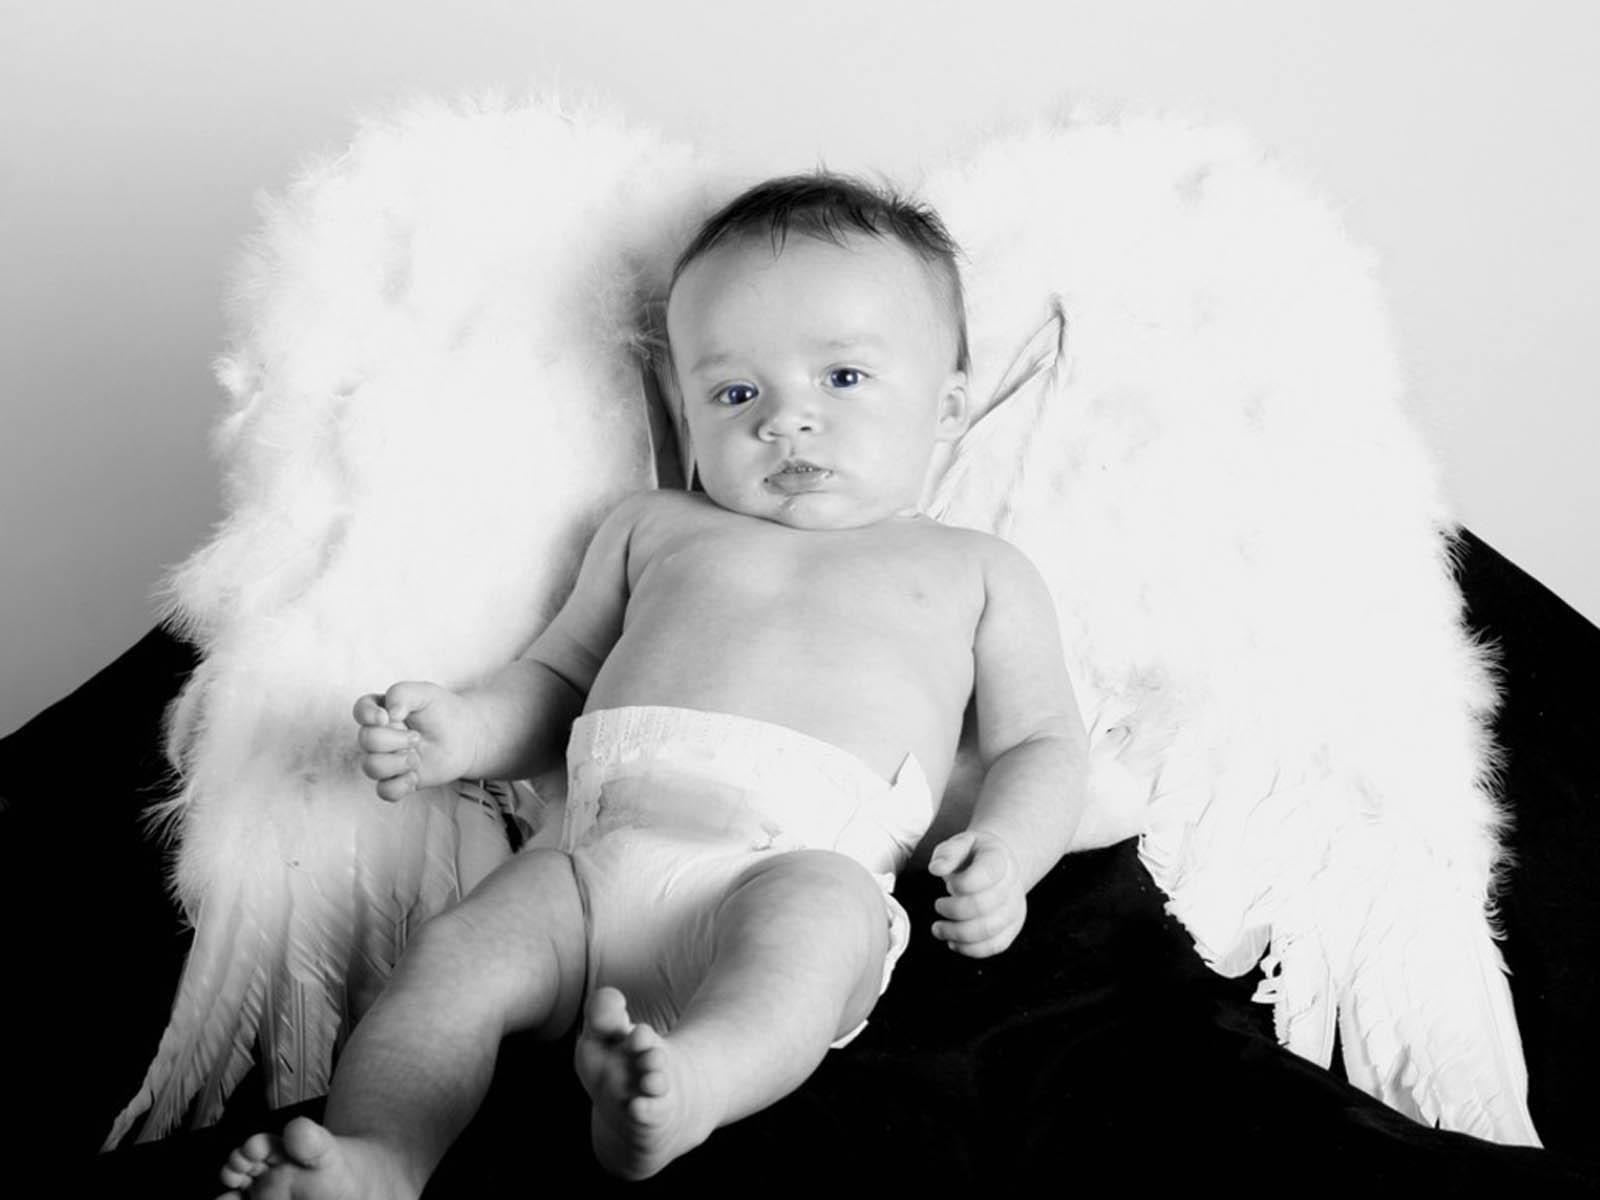 wallpapers: Angel Babies Wallpapers